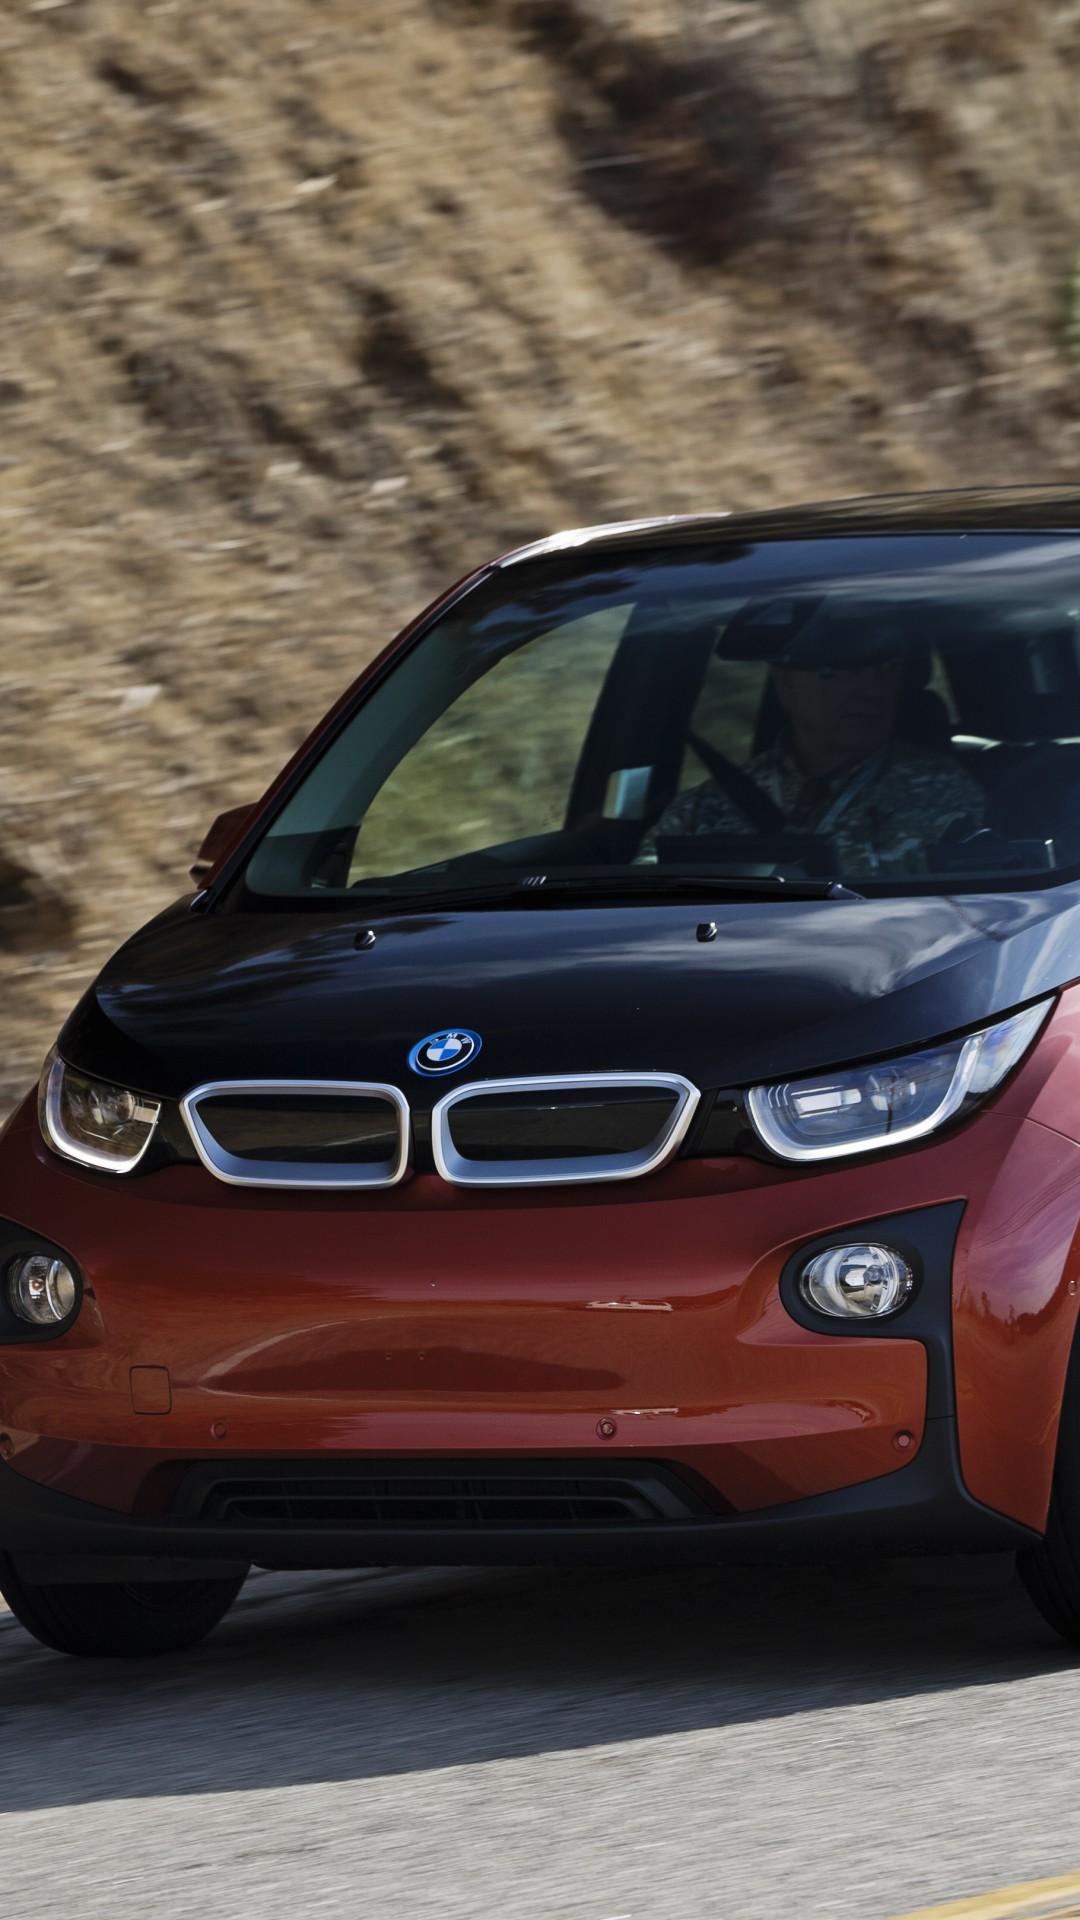 Hyundai Ioniq Electric >> Wallpaper BMW i3, hybrid, REx, MCV, carbon, city car, BMW ...